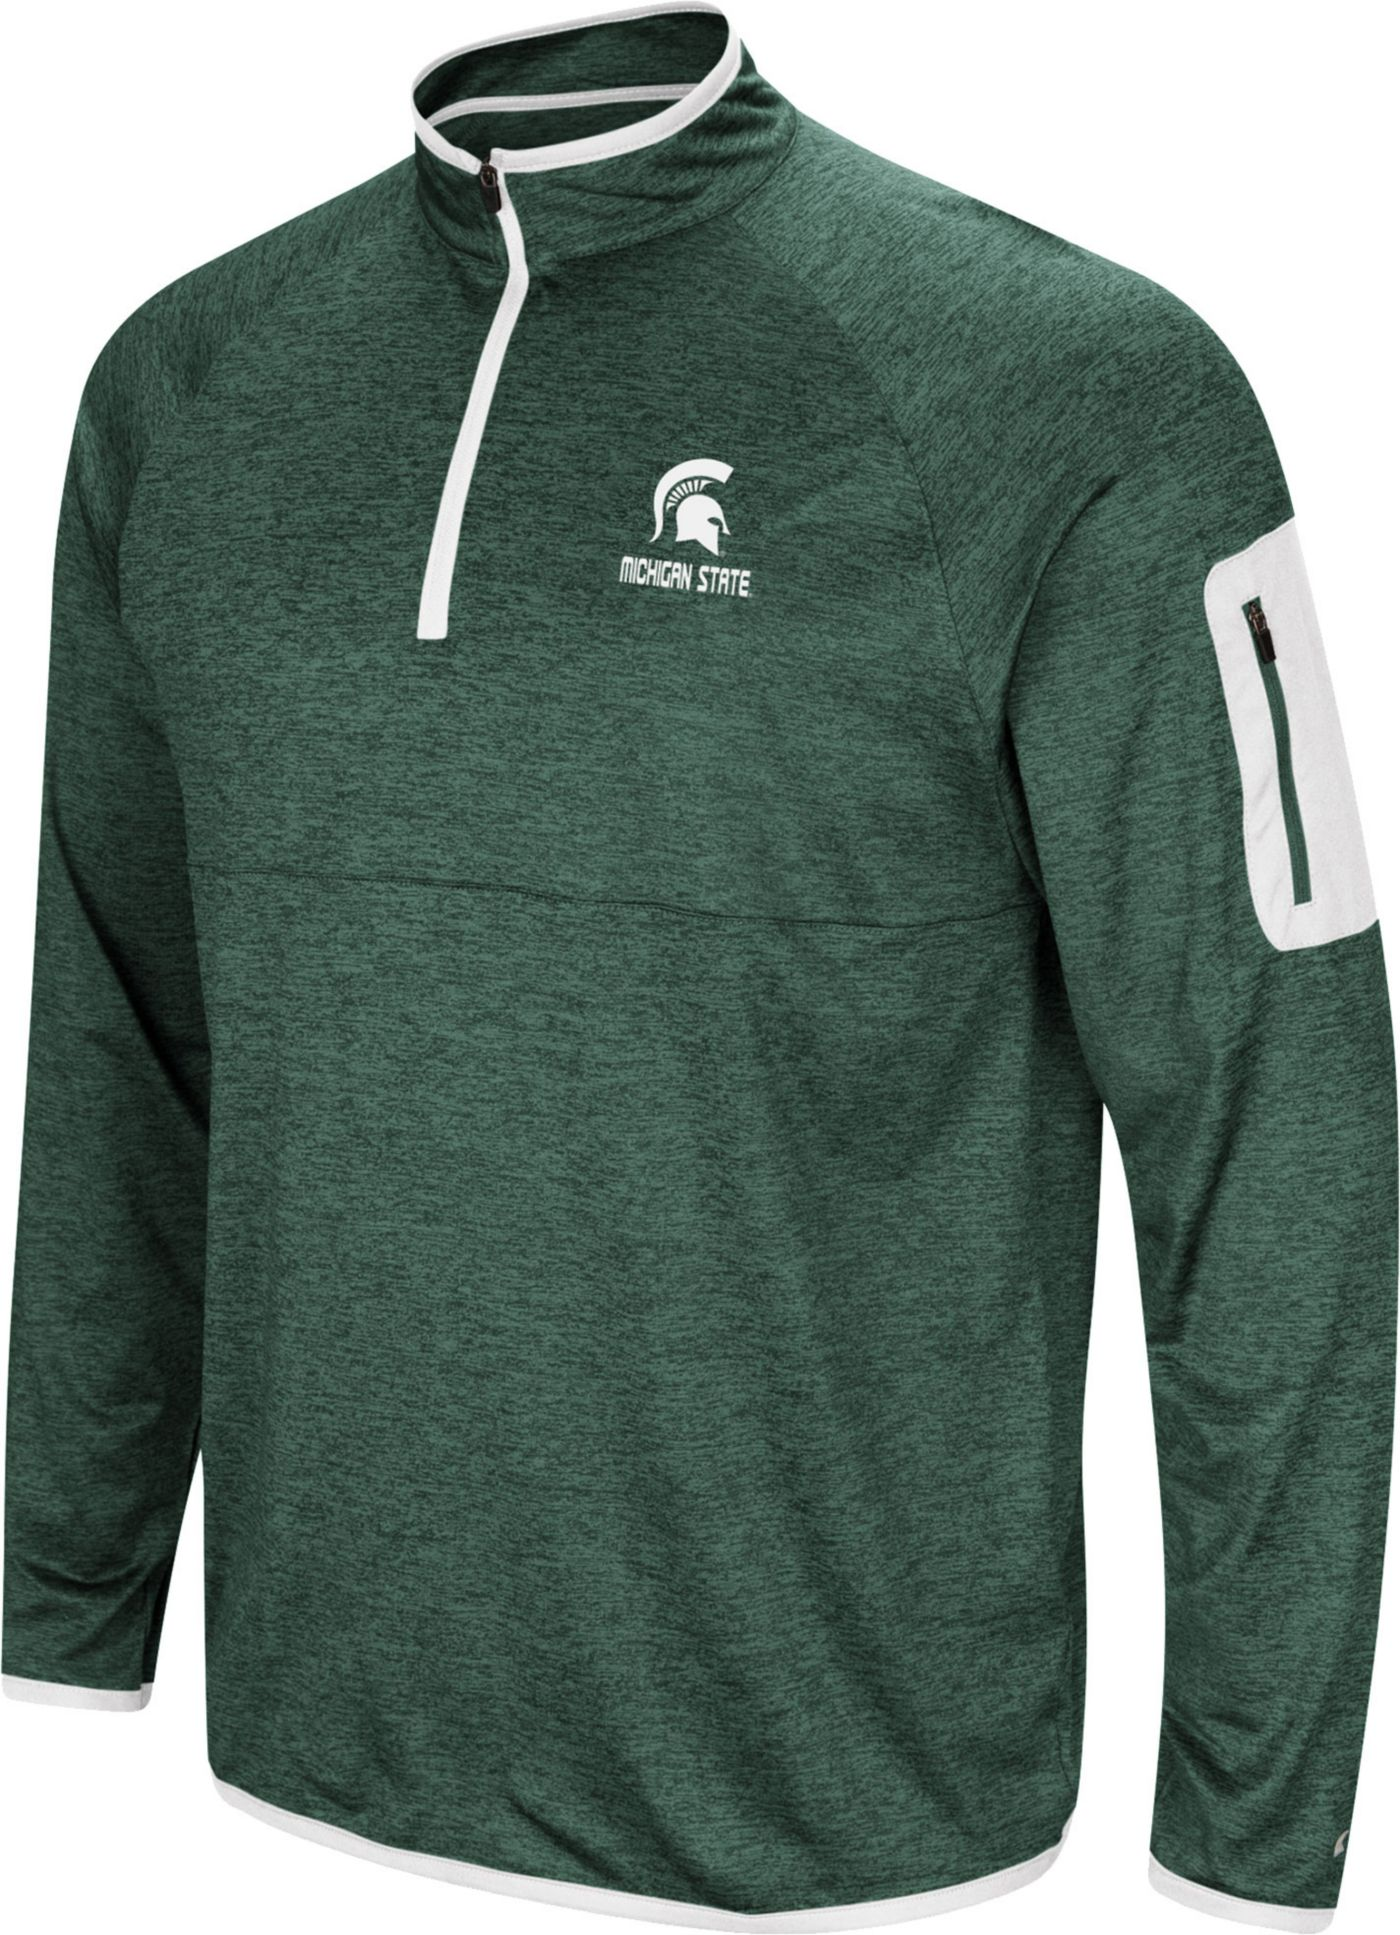 Colosseum Men's Michigan State Spartans Green Indus River Quarter-Zip Shirt